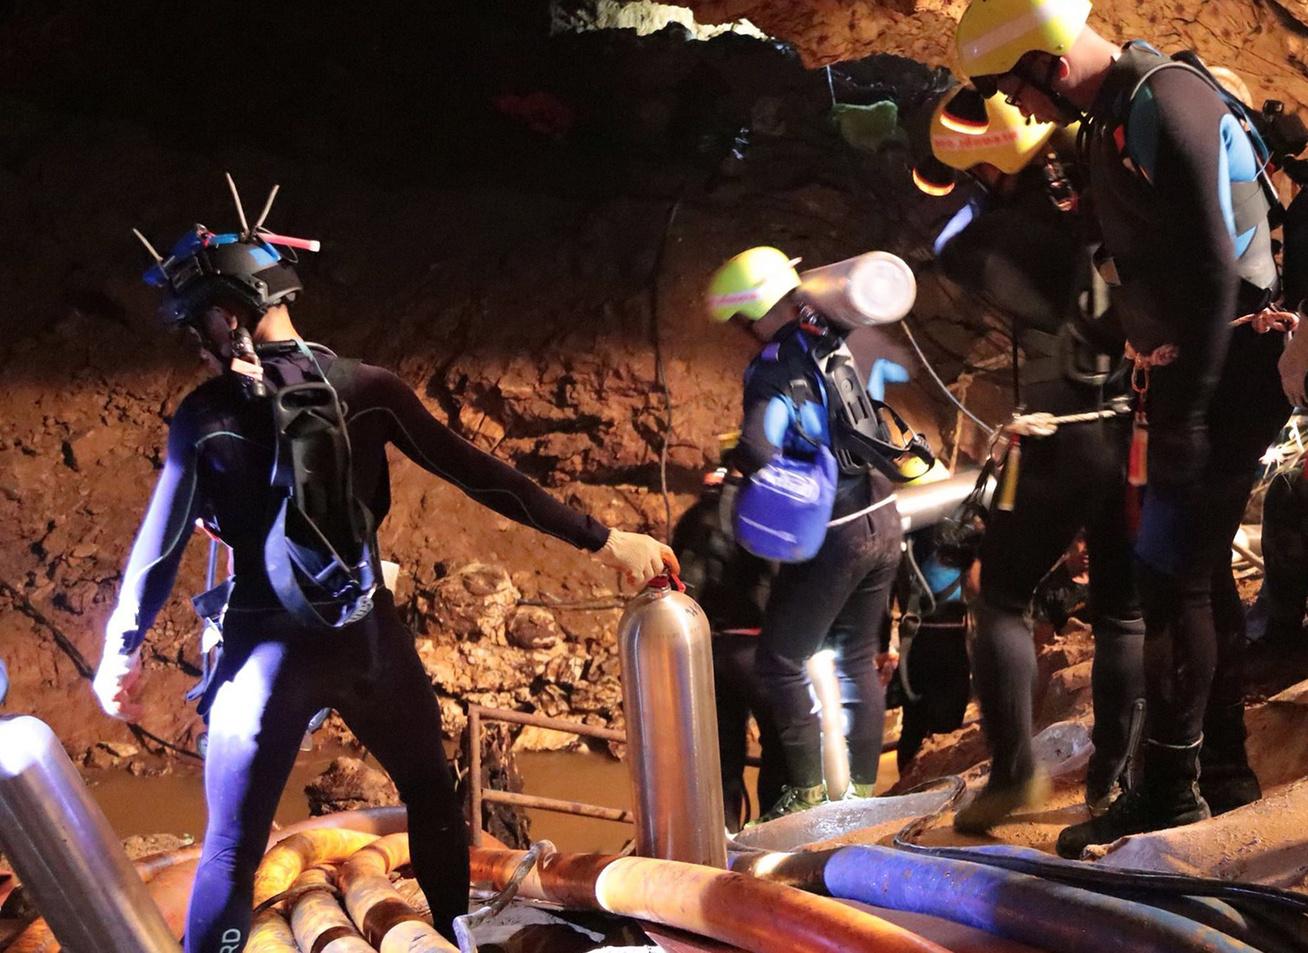 thai-barlang-gyerekek